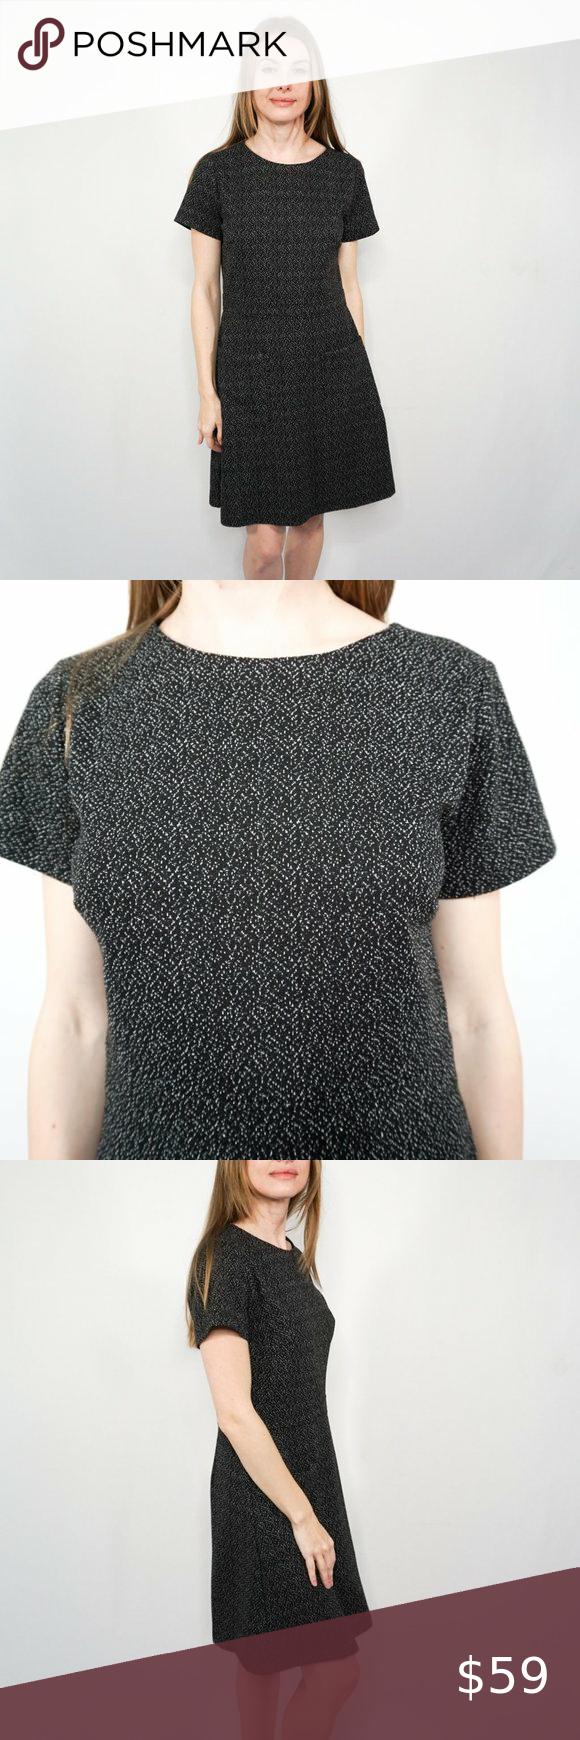 Loft Black White Marled Short Sleeve Knit Dress Maxi Dress With Sleeves Knit Dress Wrap Sweater Dress [ 1740 x 580 Pixel ]